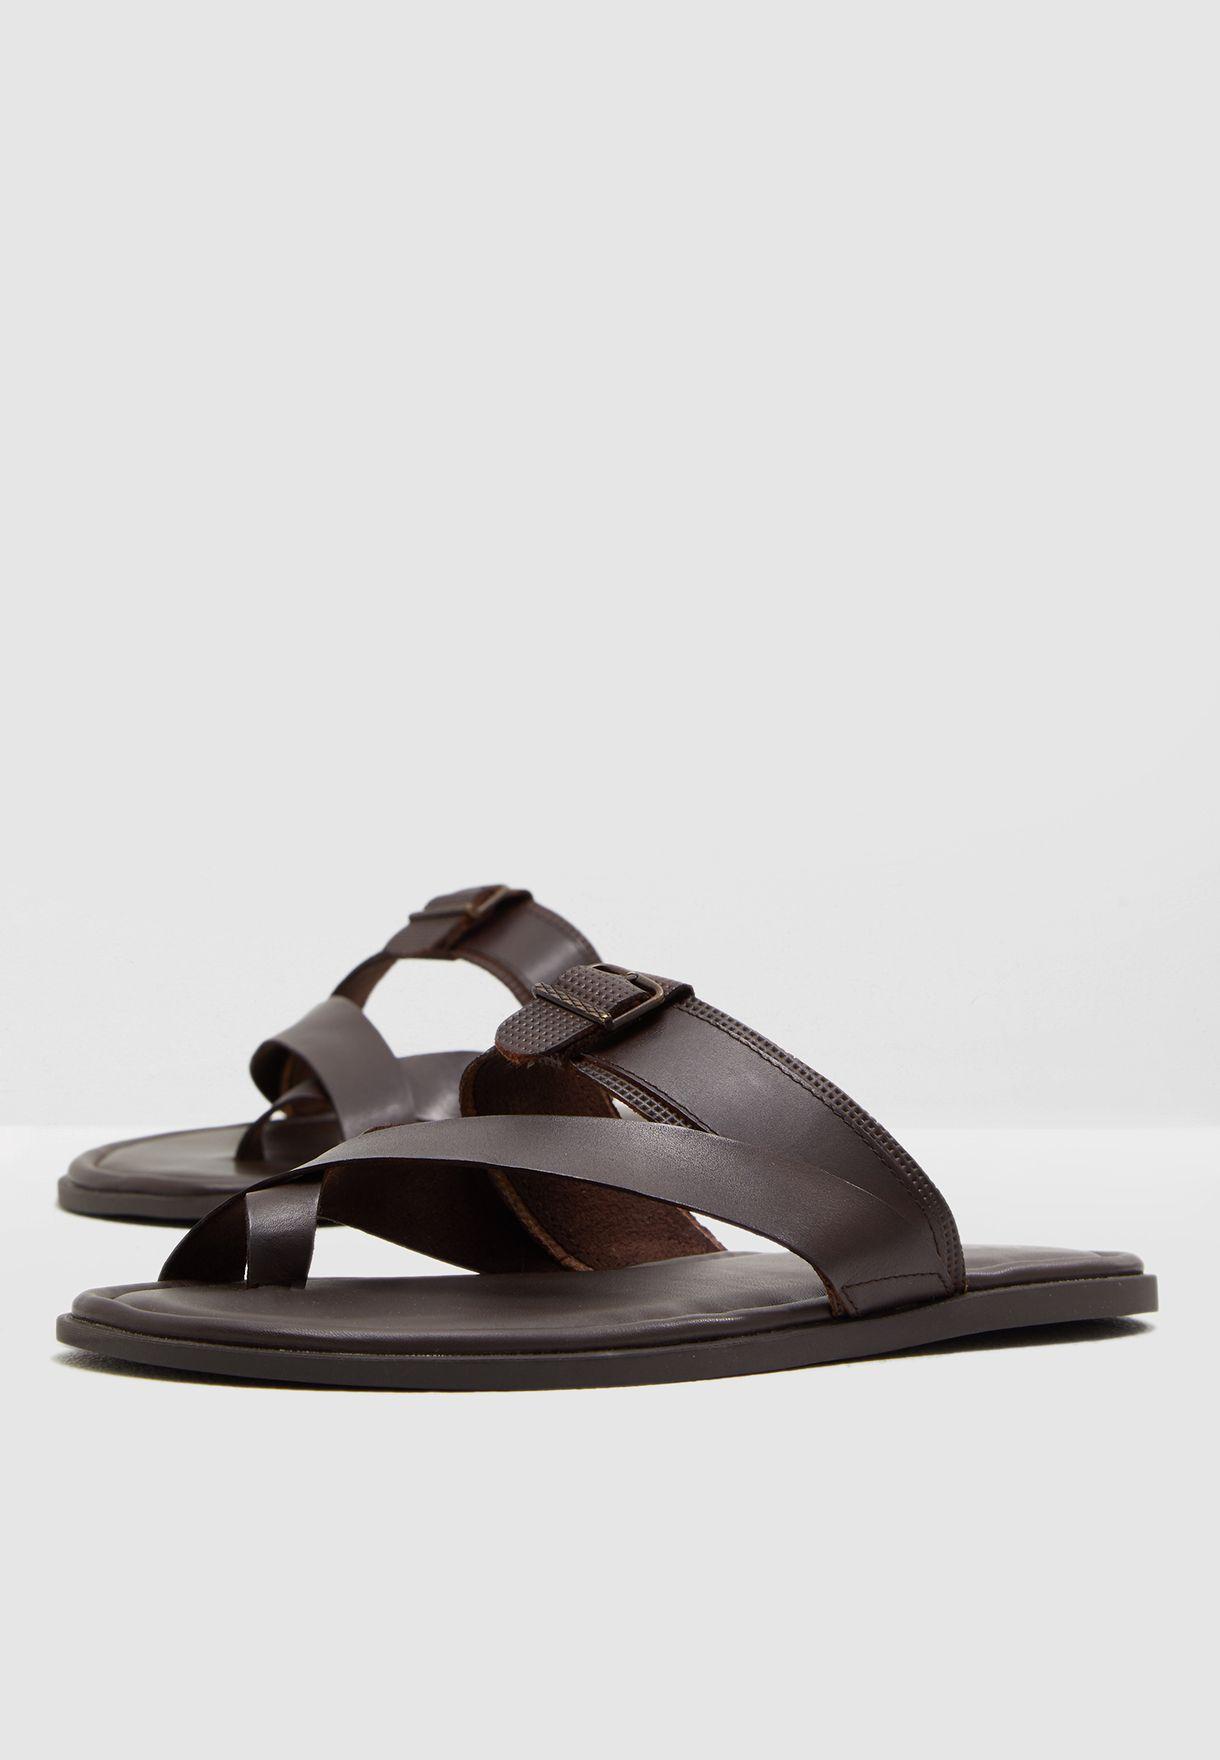 Baecci Sandals